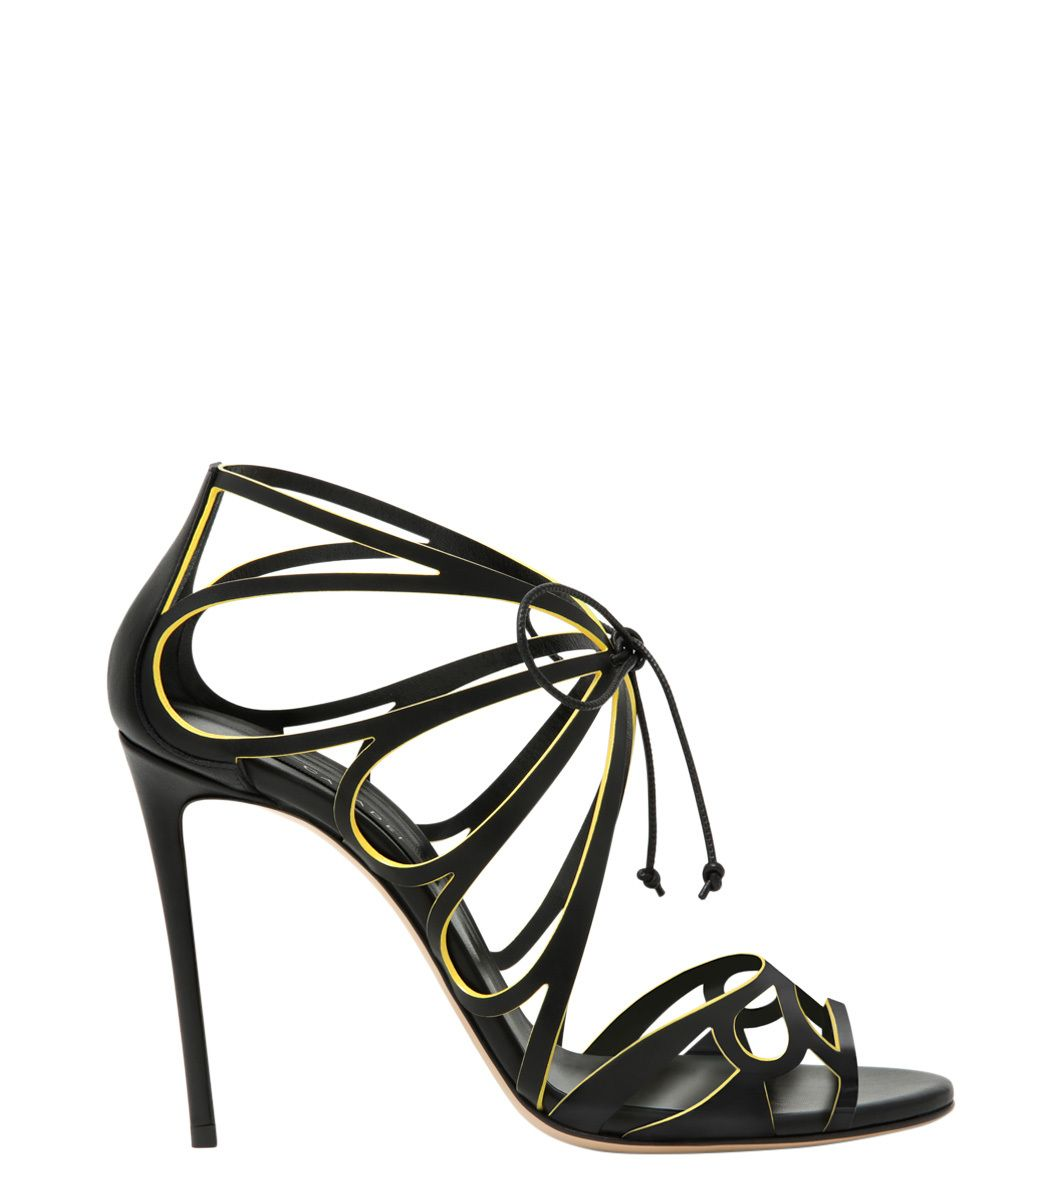 Casadei Black Strappy Sandal